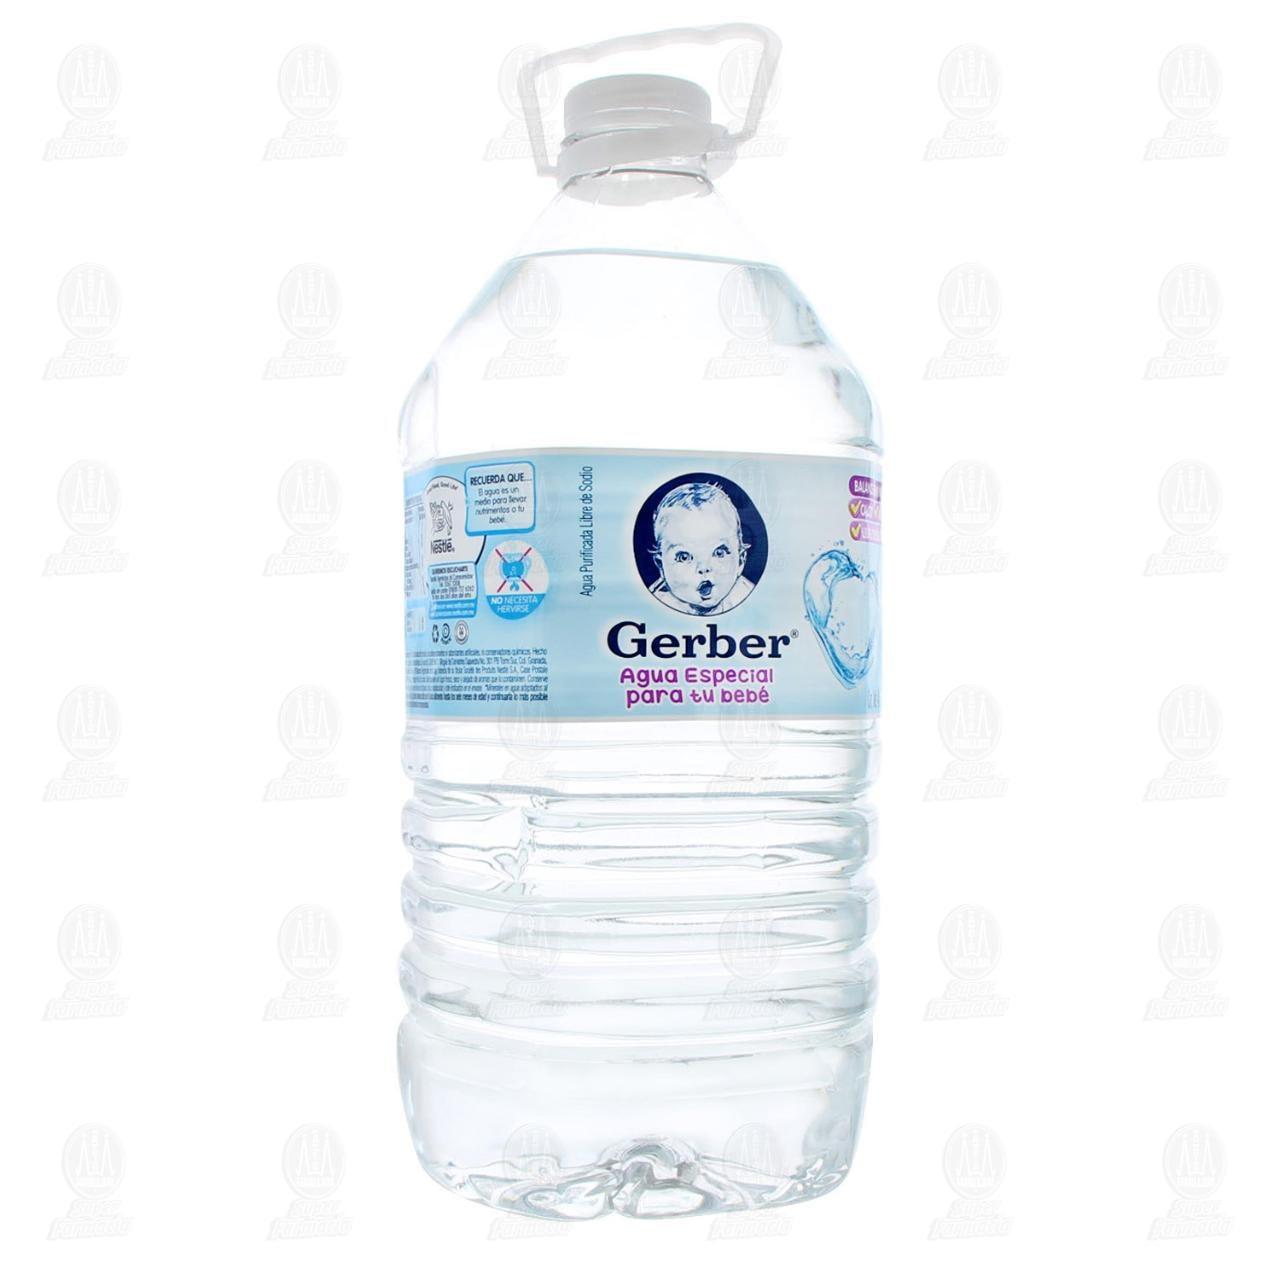 Comprar Agua Gerber Natural, 4 l. en Farmacias Guadalajara